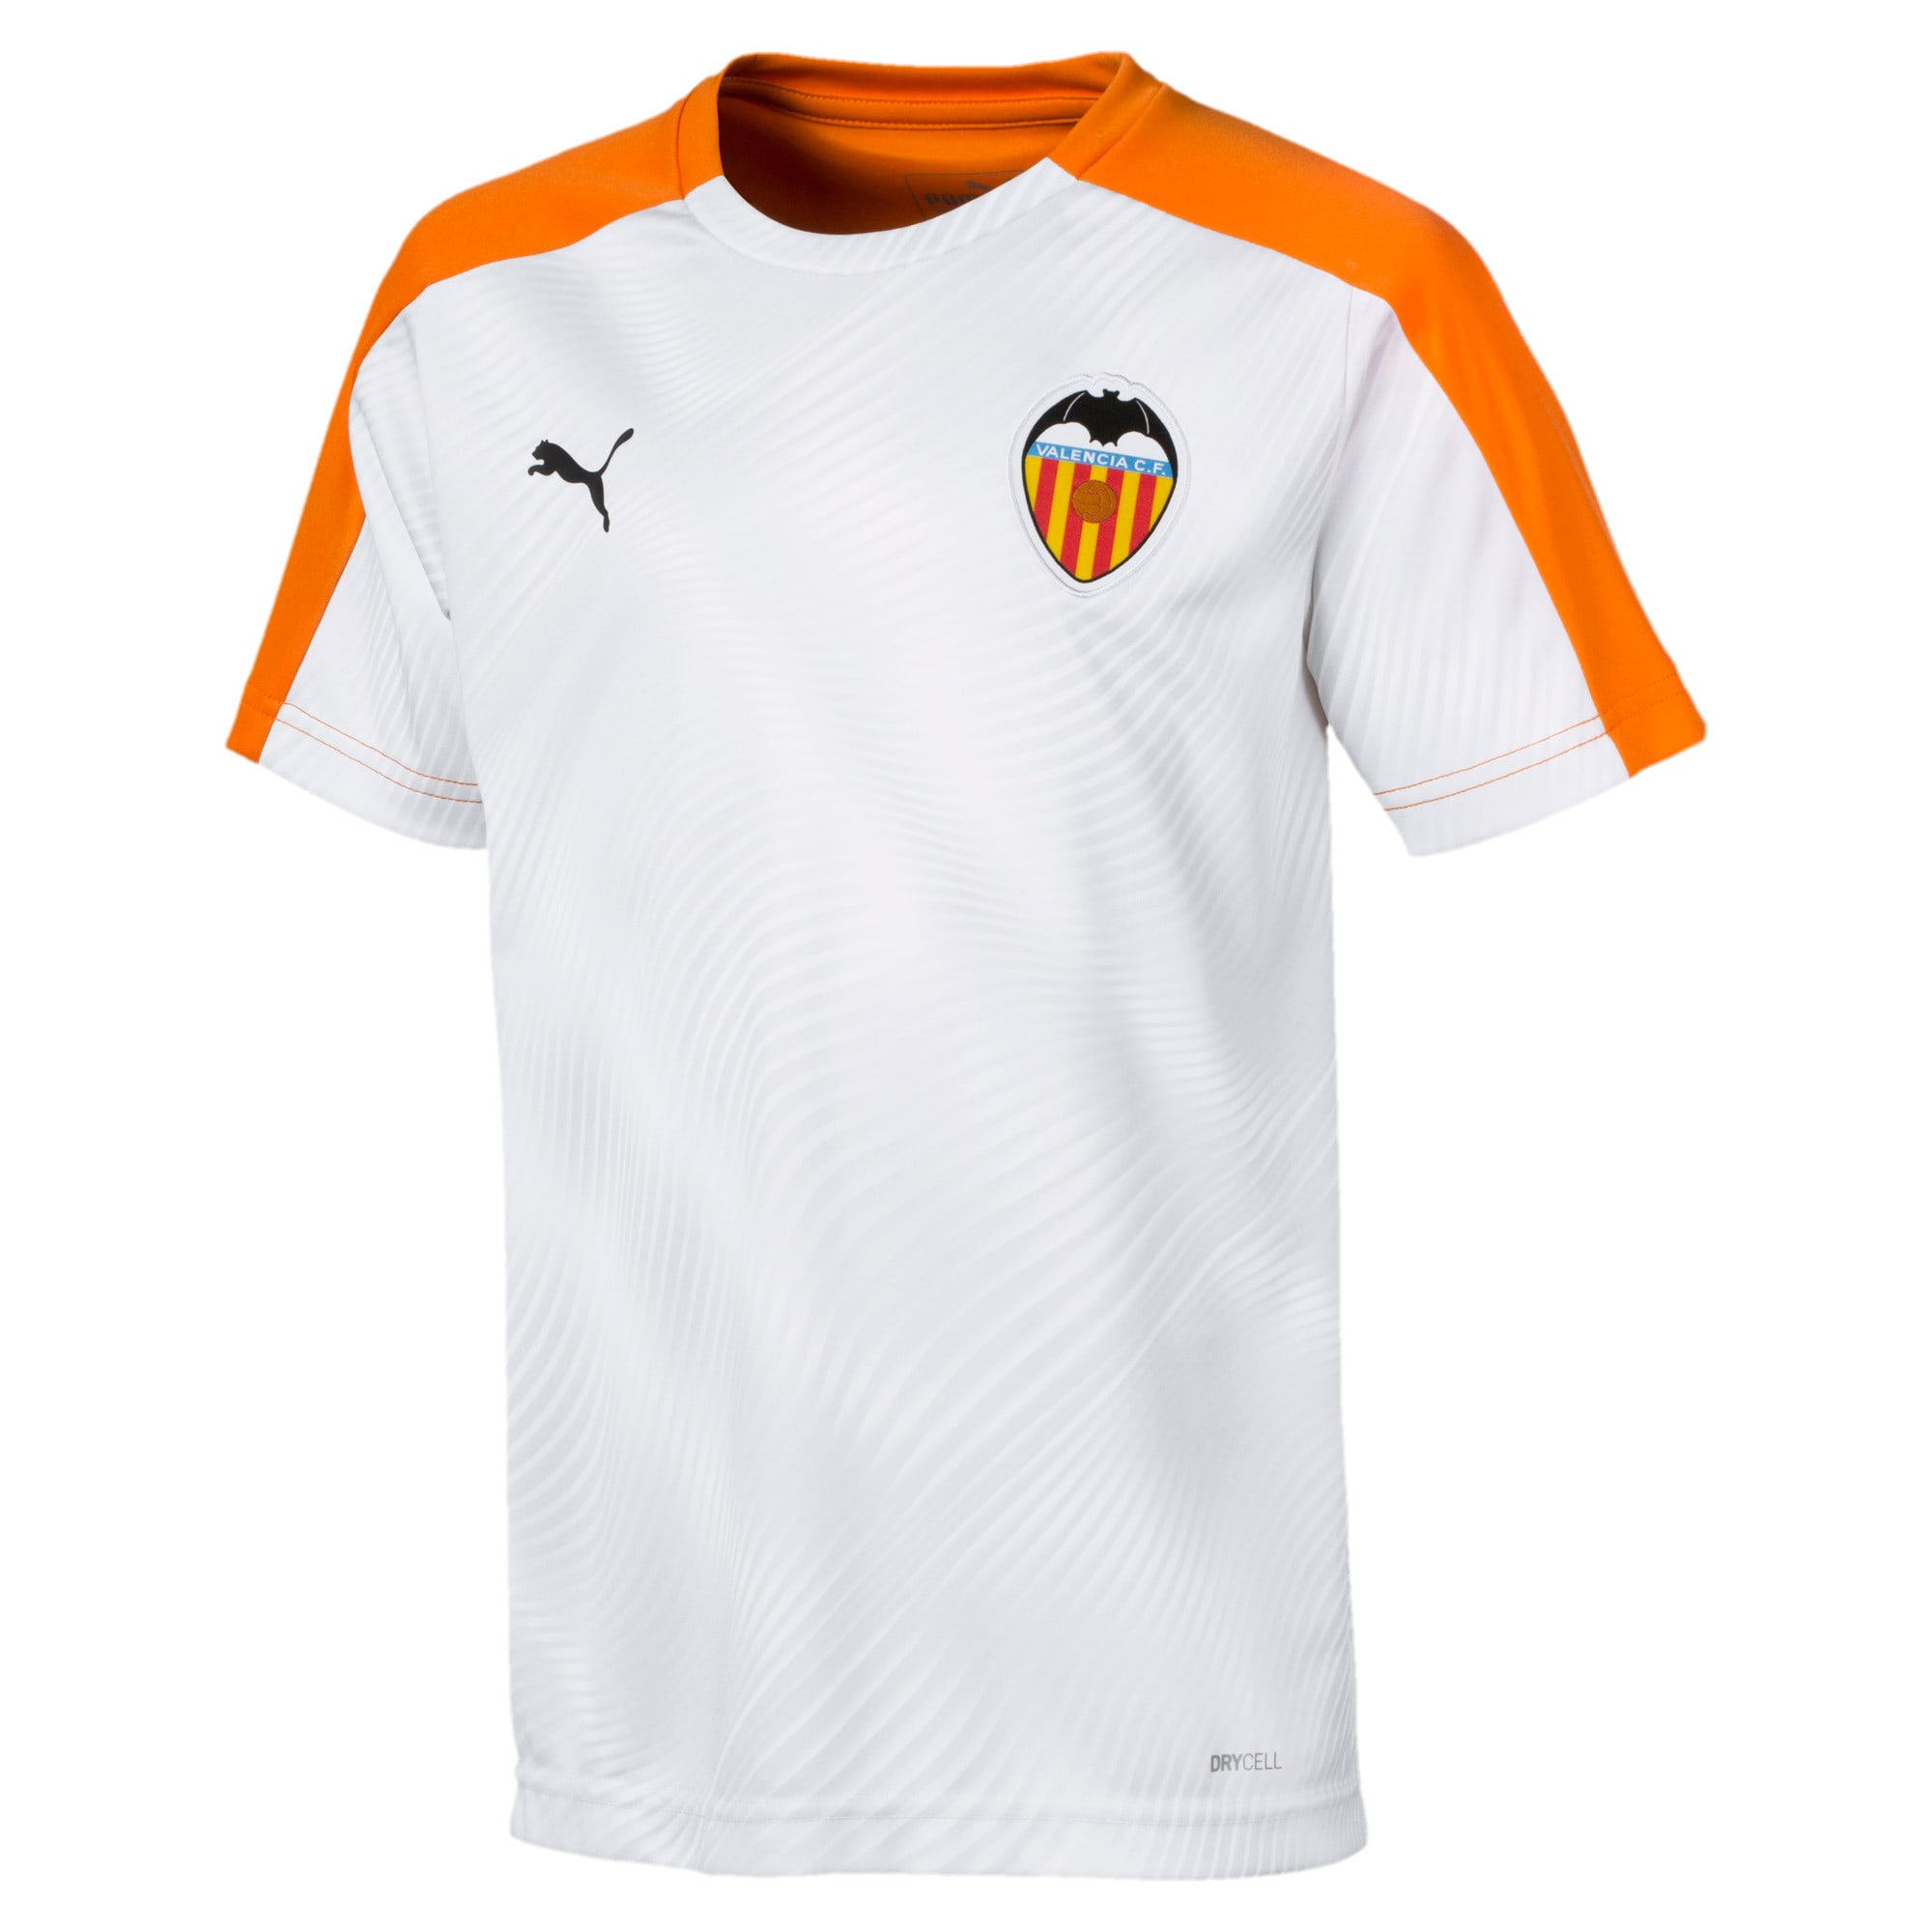 Imagen en miniatura 1 de Camiseta de niño Stadium Valencia CF, Vibrant Orange-Puma White, mediana